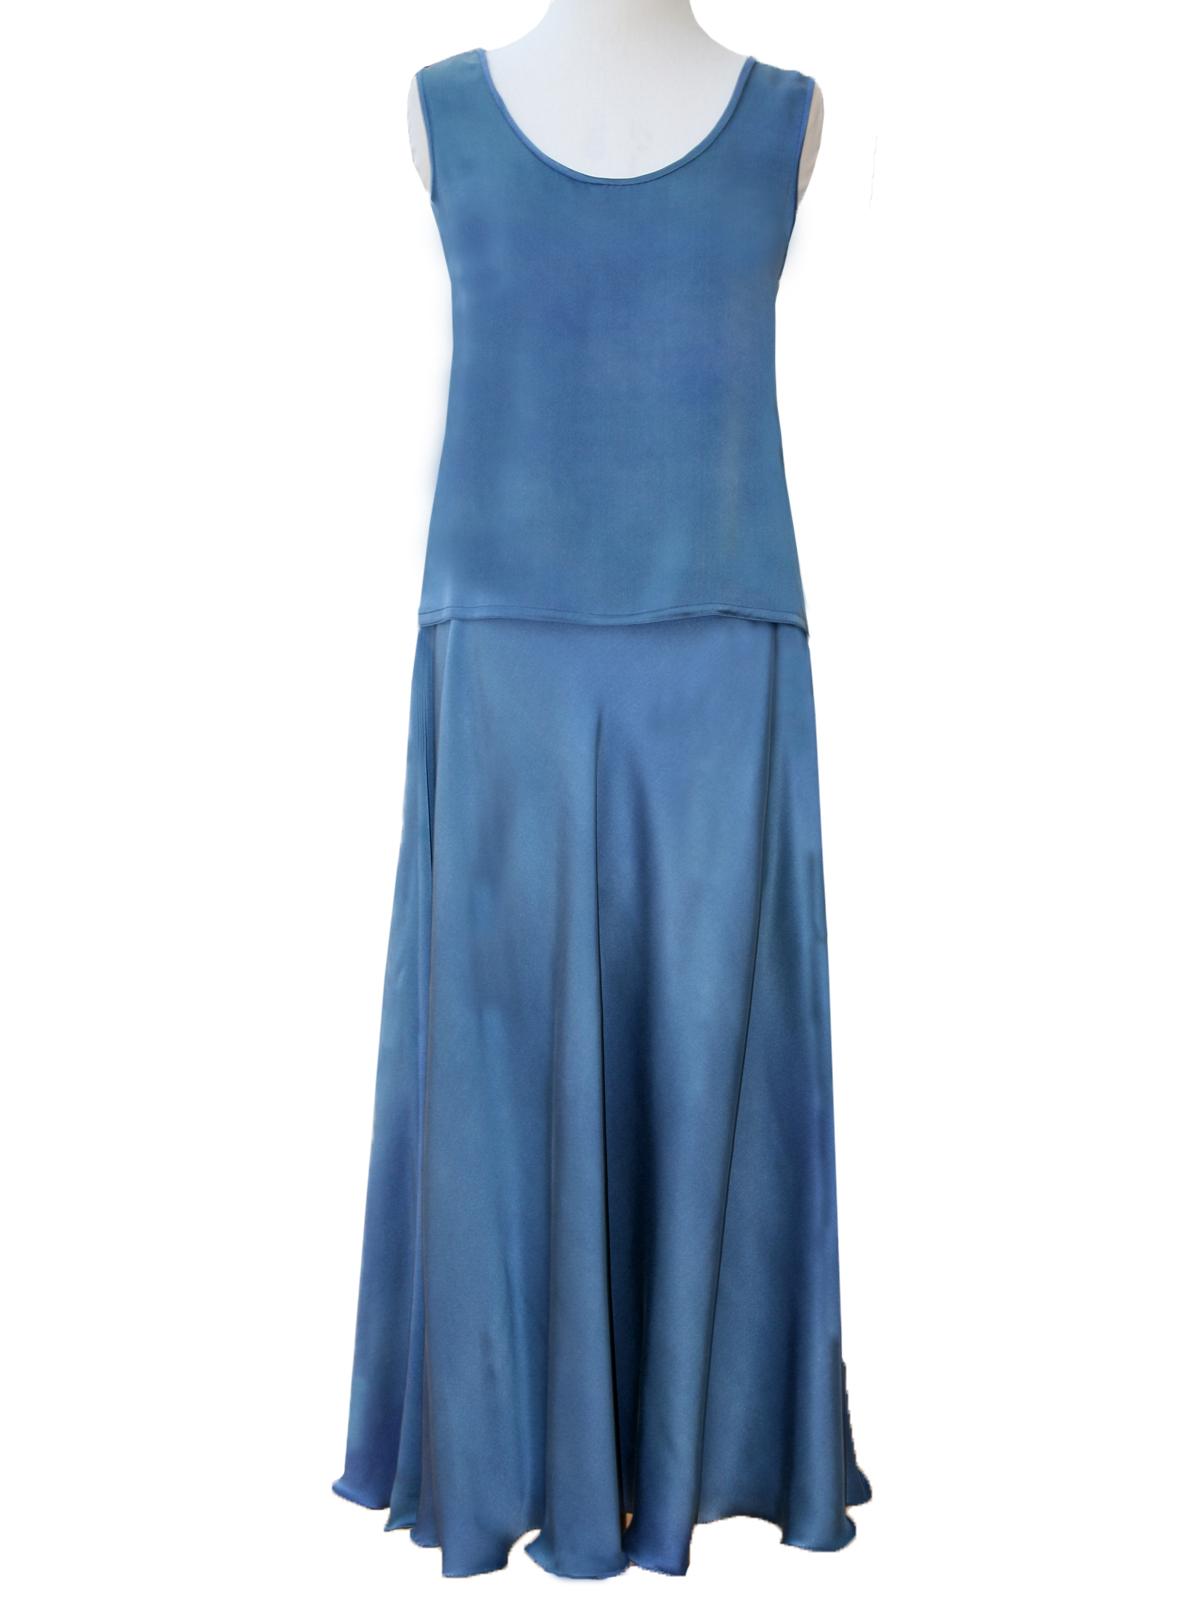 Vest Tabard Top & Bias Skirt -6621